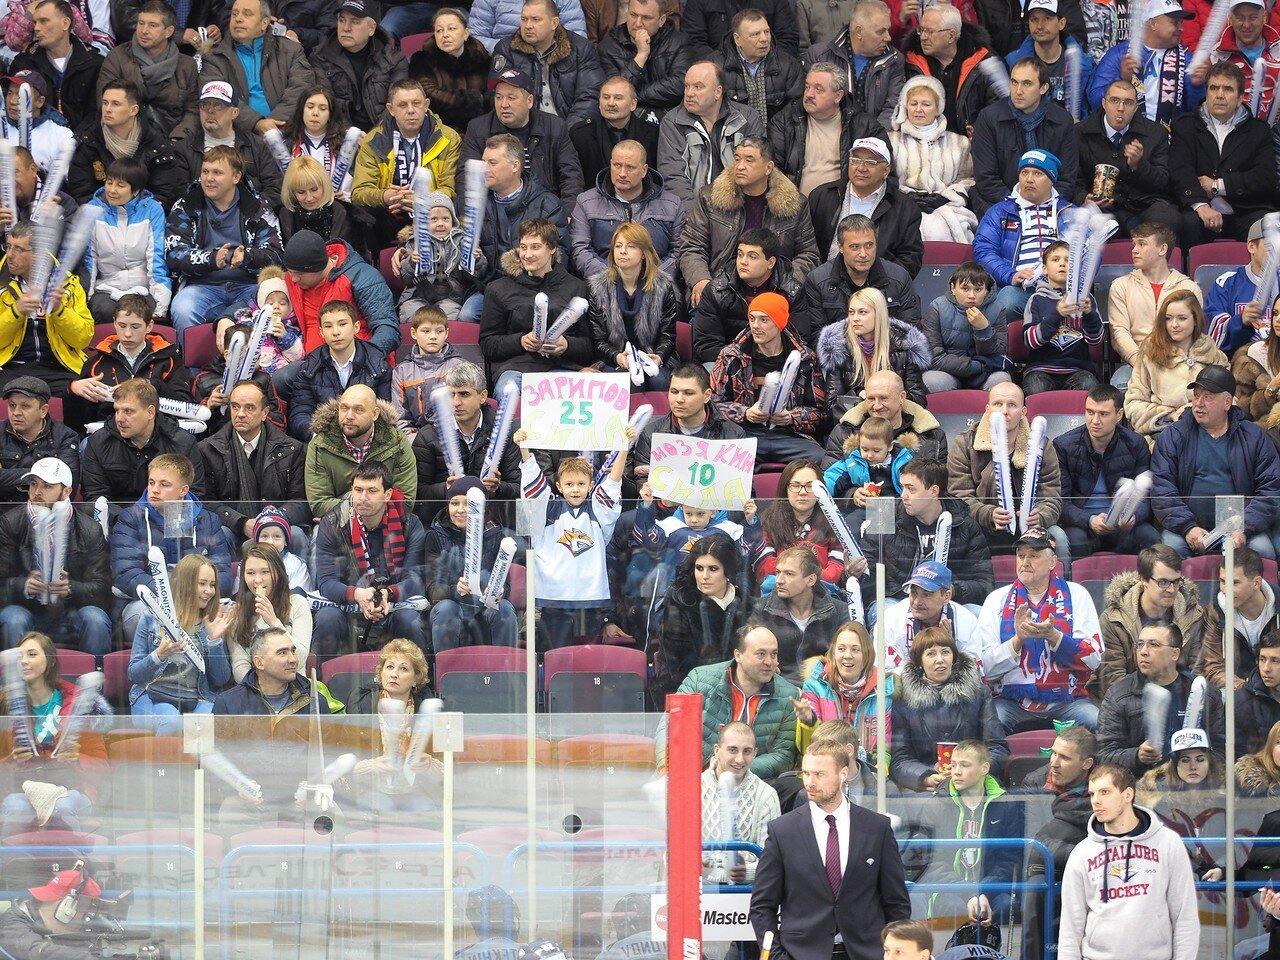 58Плей-офф 2016 Восток 1/2 Металлург - Сибирь 10.03.2016